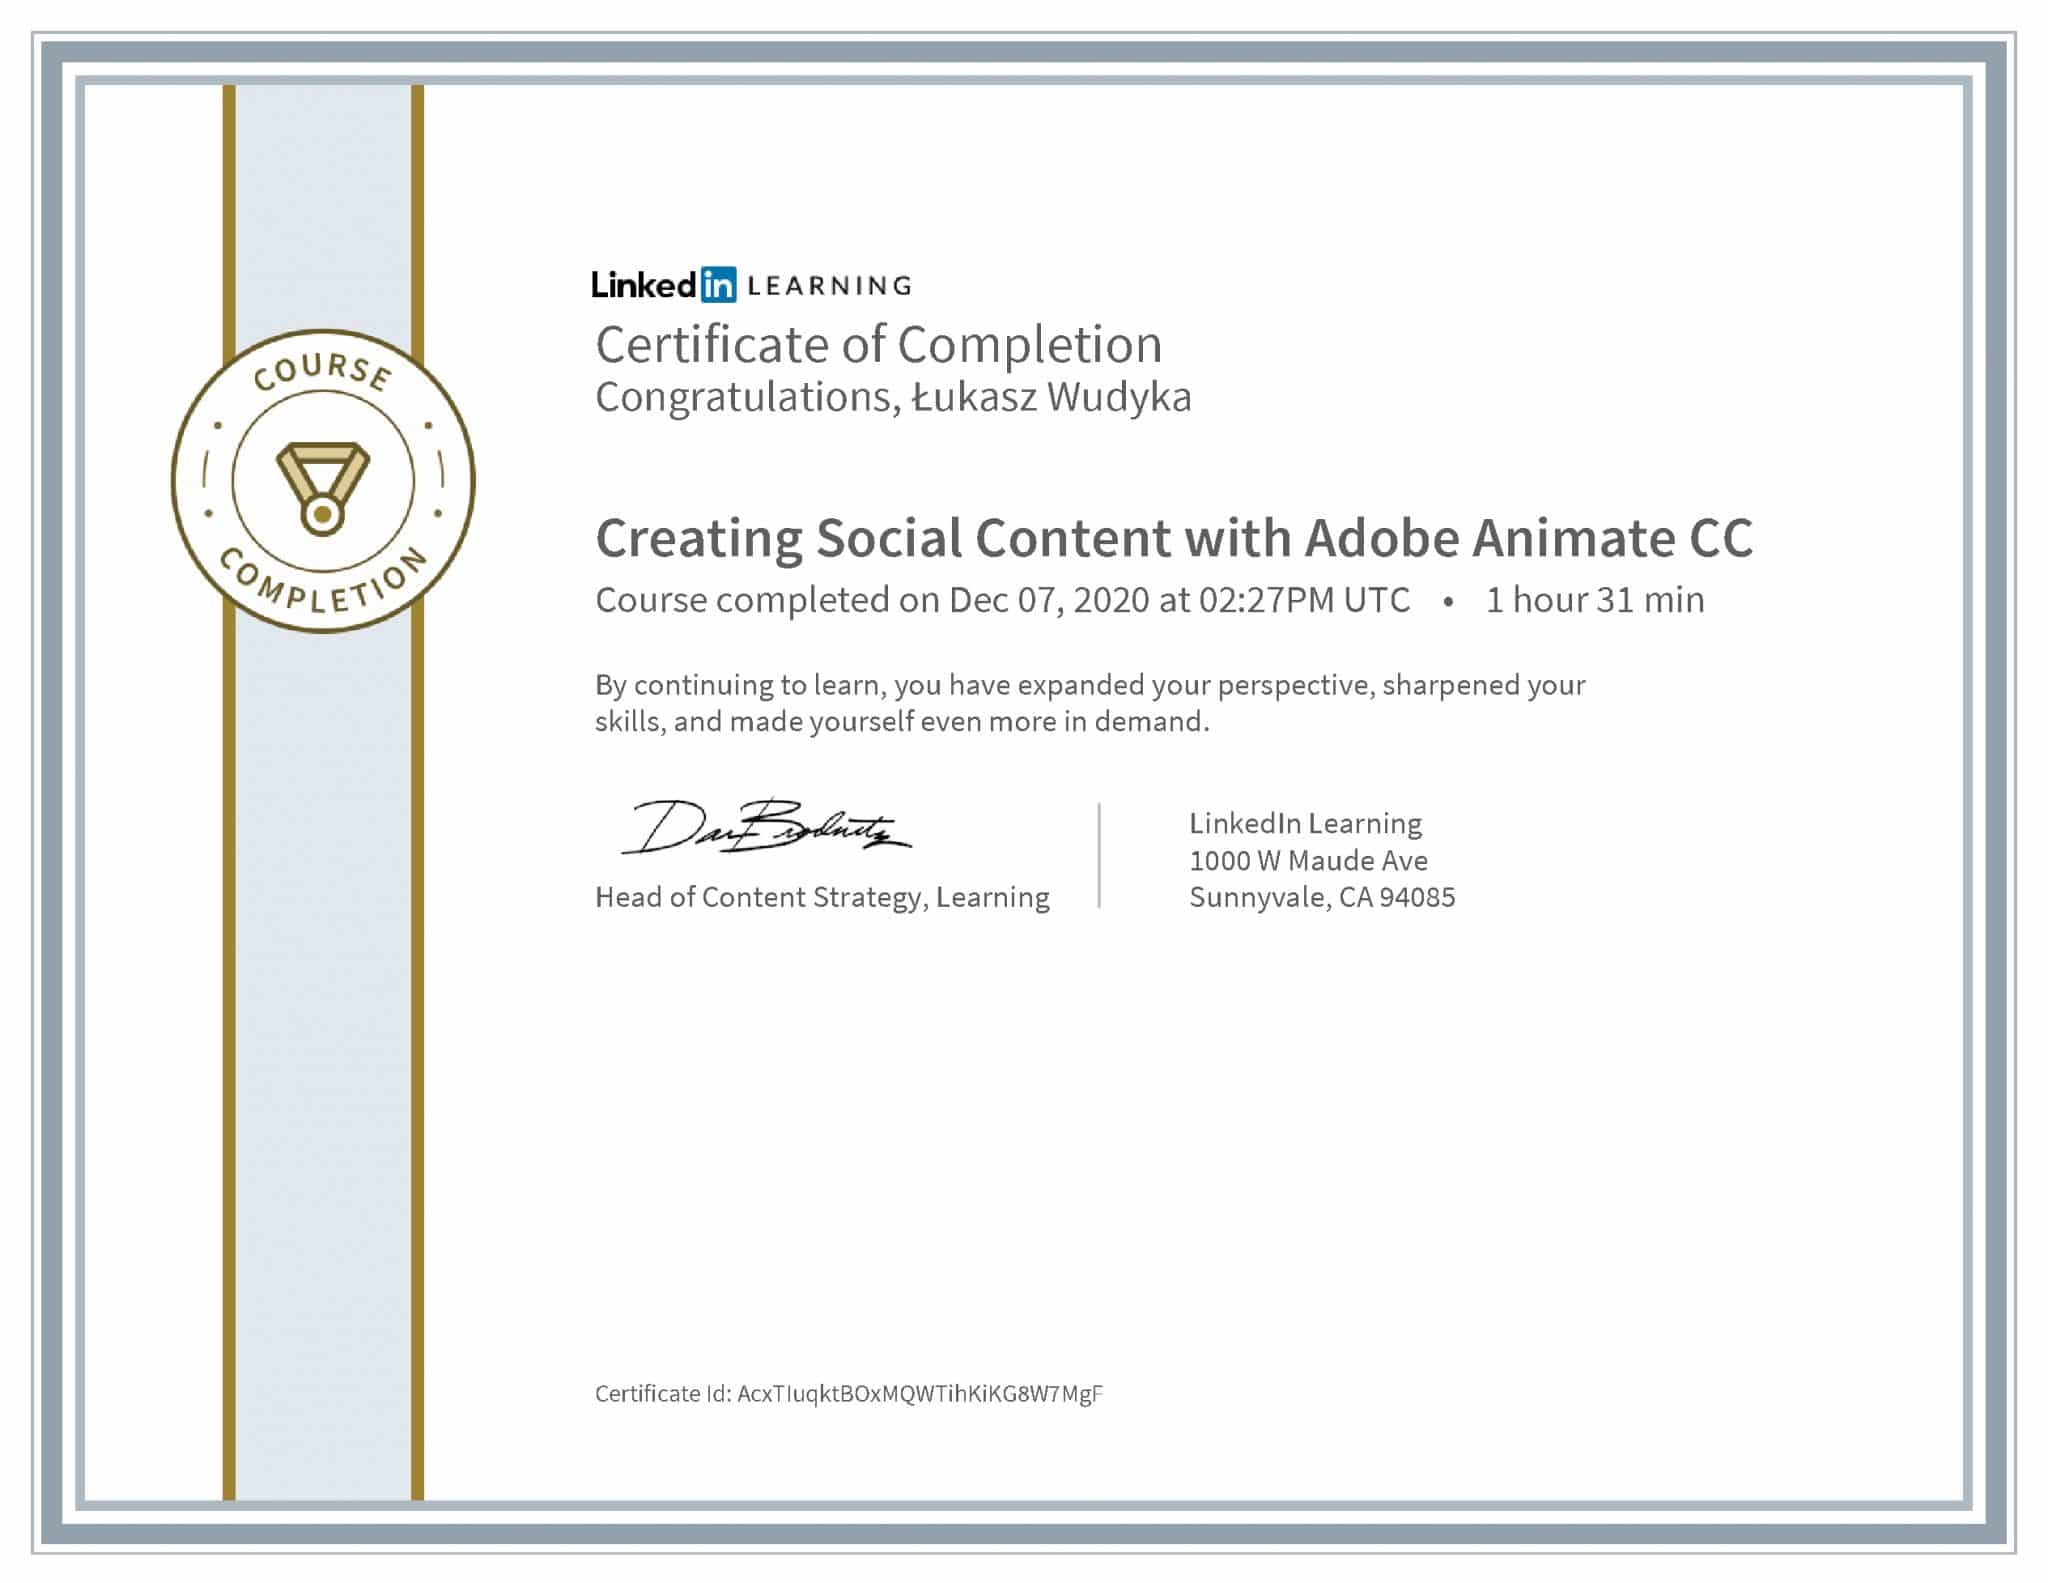 Łukasz Wudyka certyfikat LinkedIn Creating Social Content with Adobe Animate CC